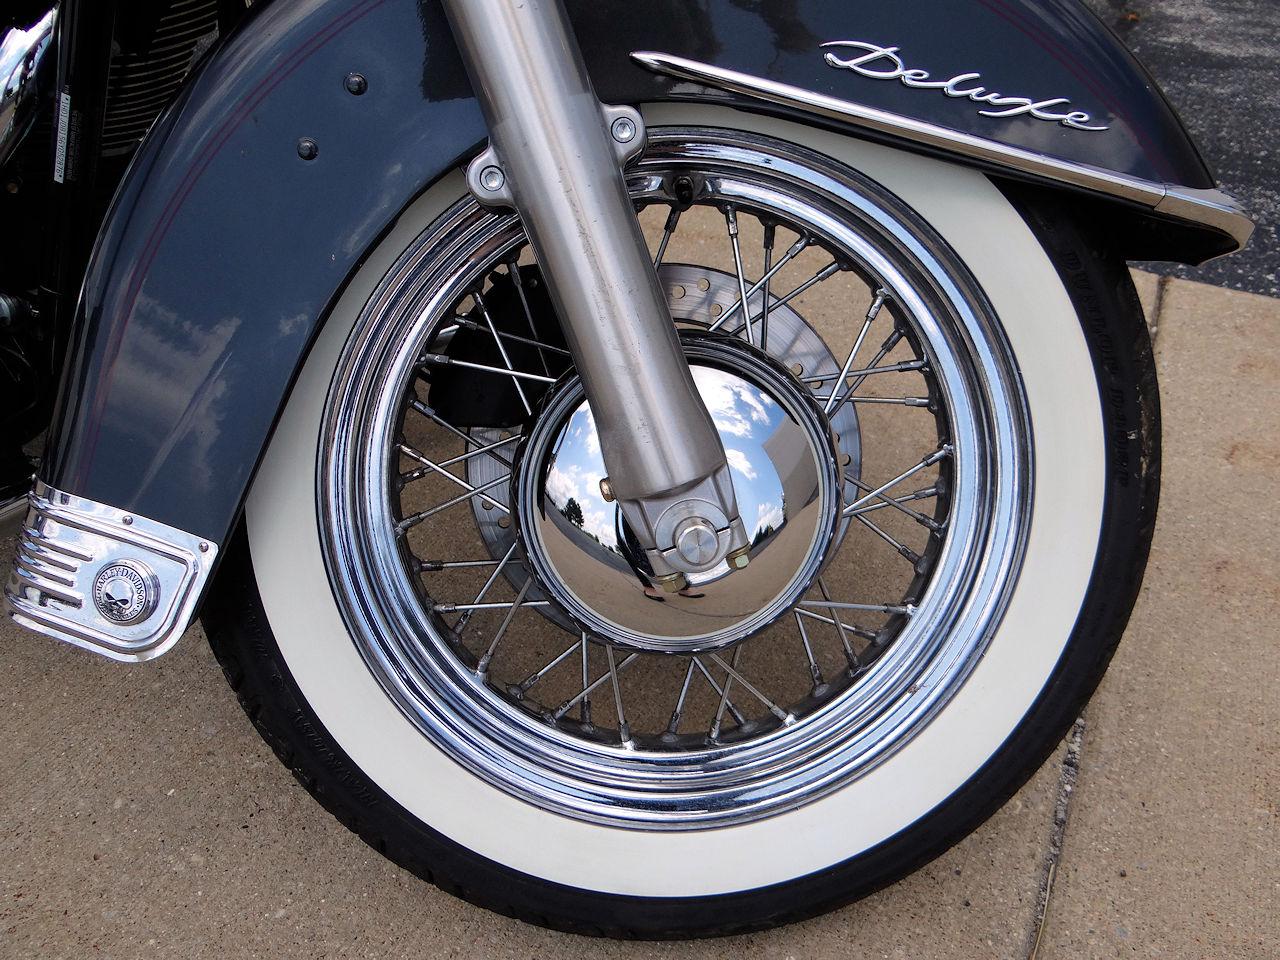 2006 Harley Davidson FLSTNI 11